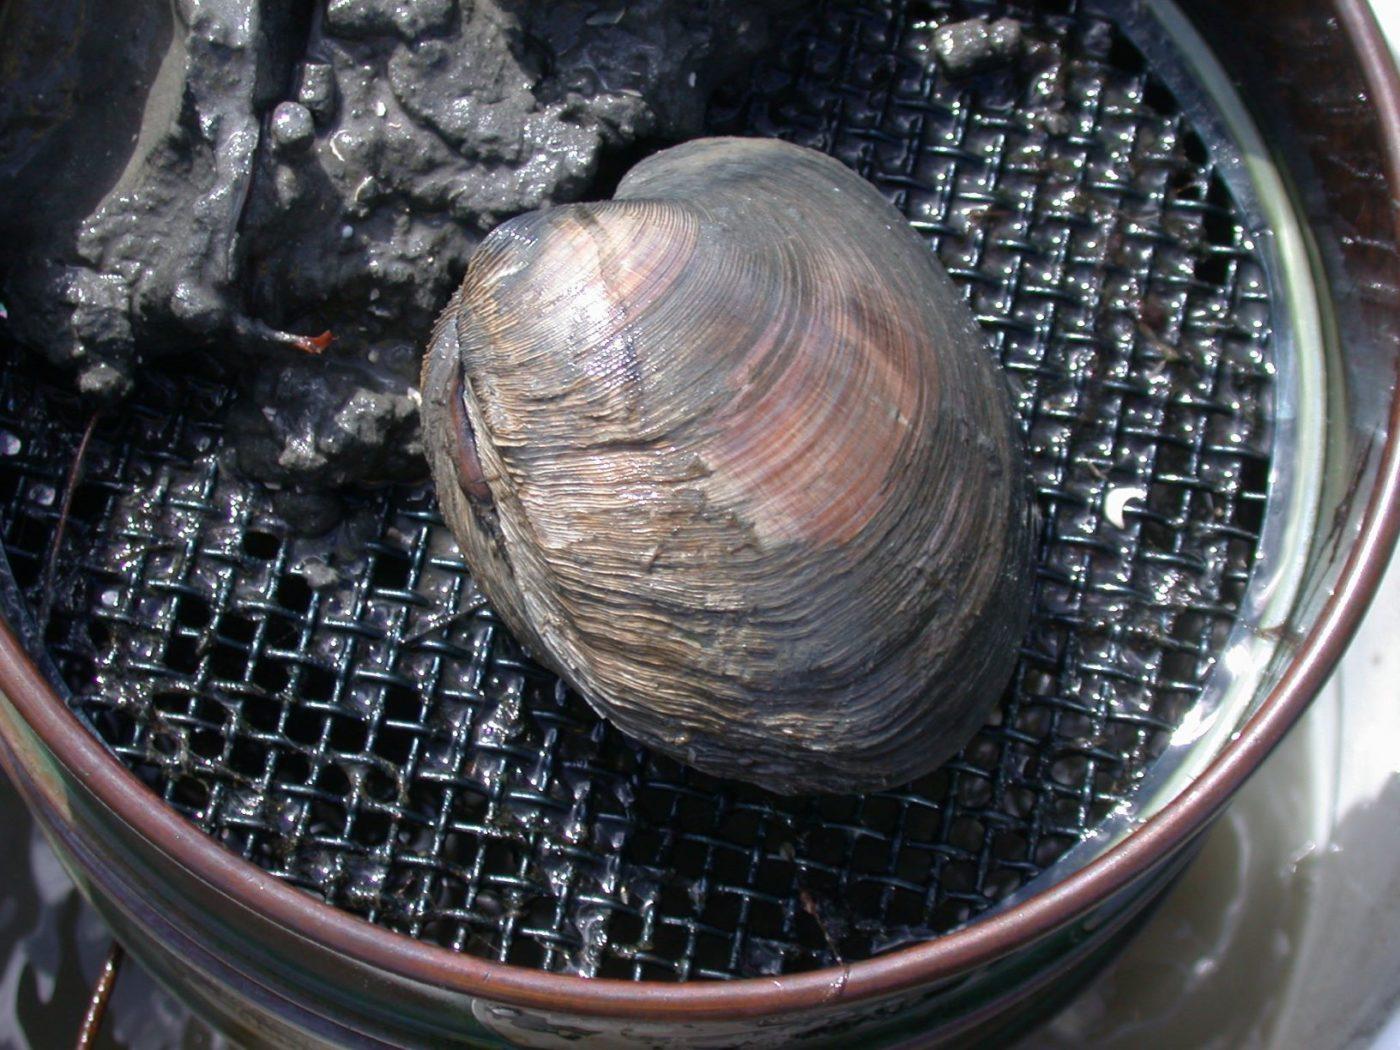 A quahog clam in a benthic sample.